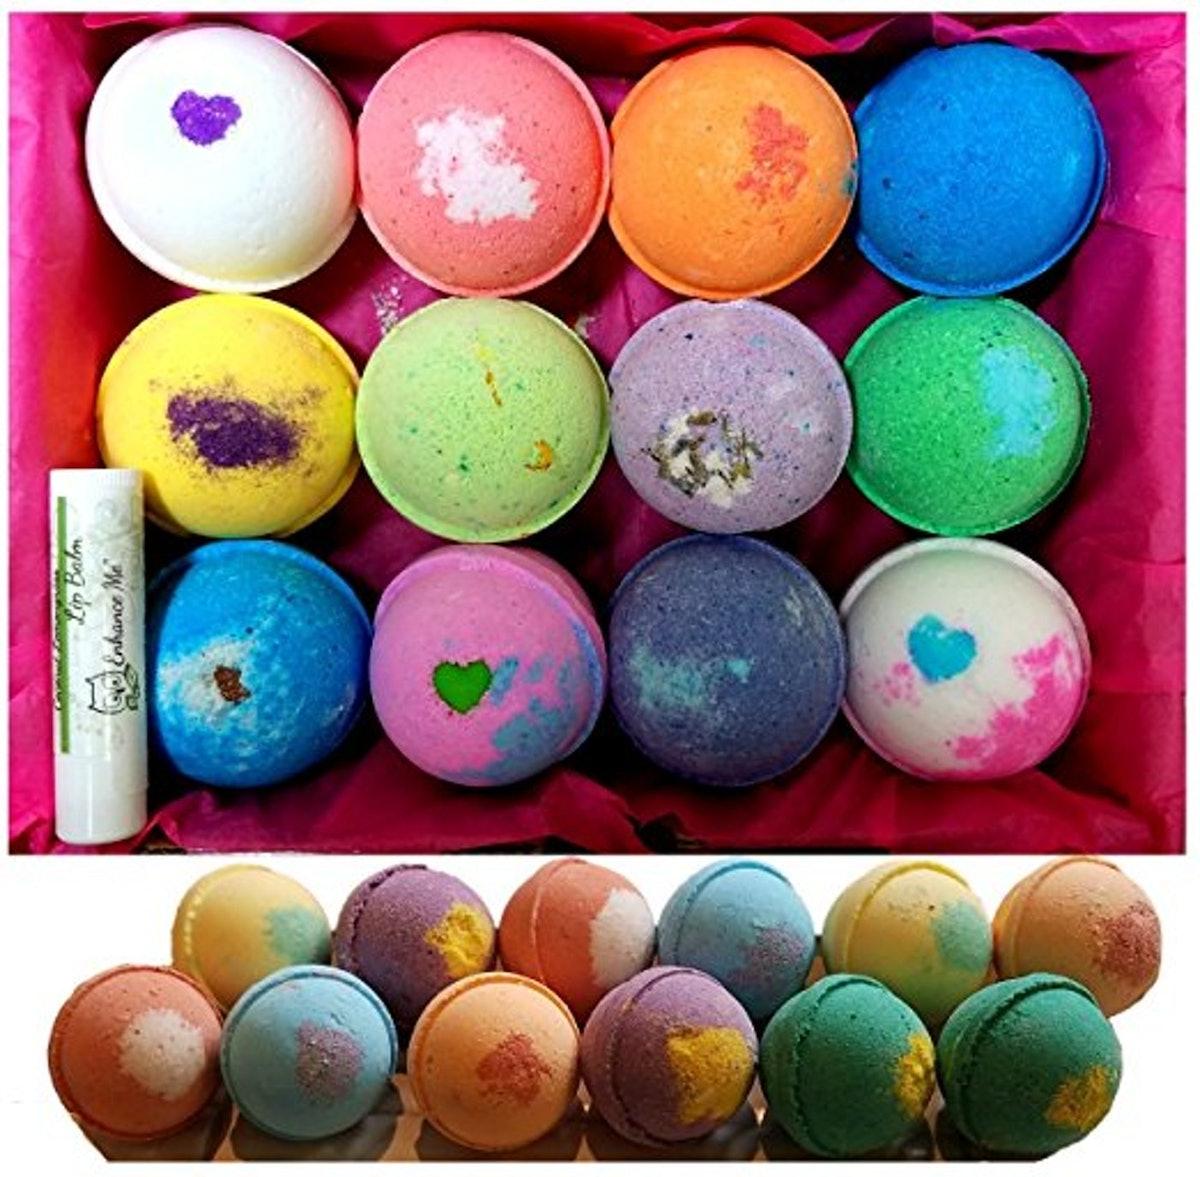 Enhance Me Bath Bombs Gift Set